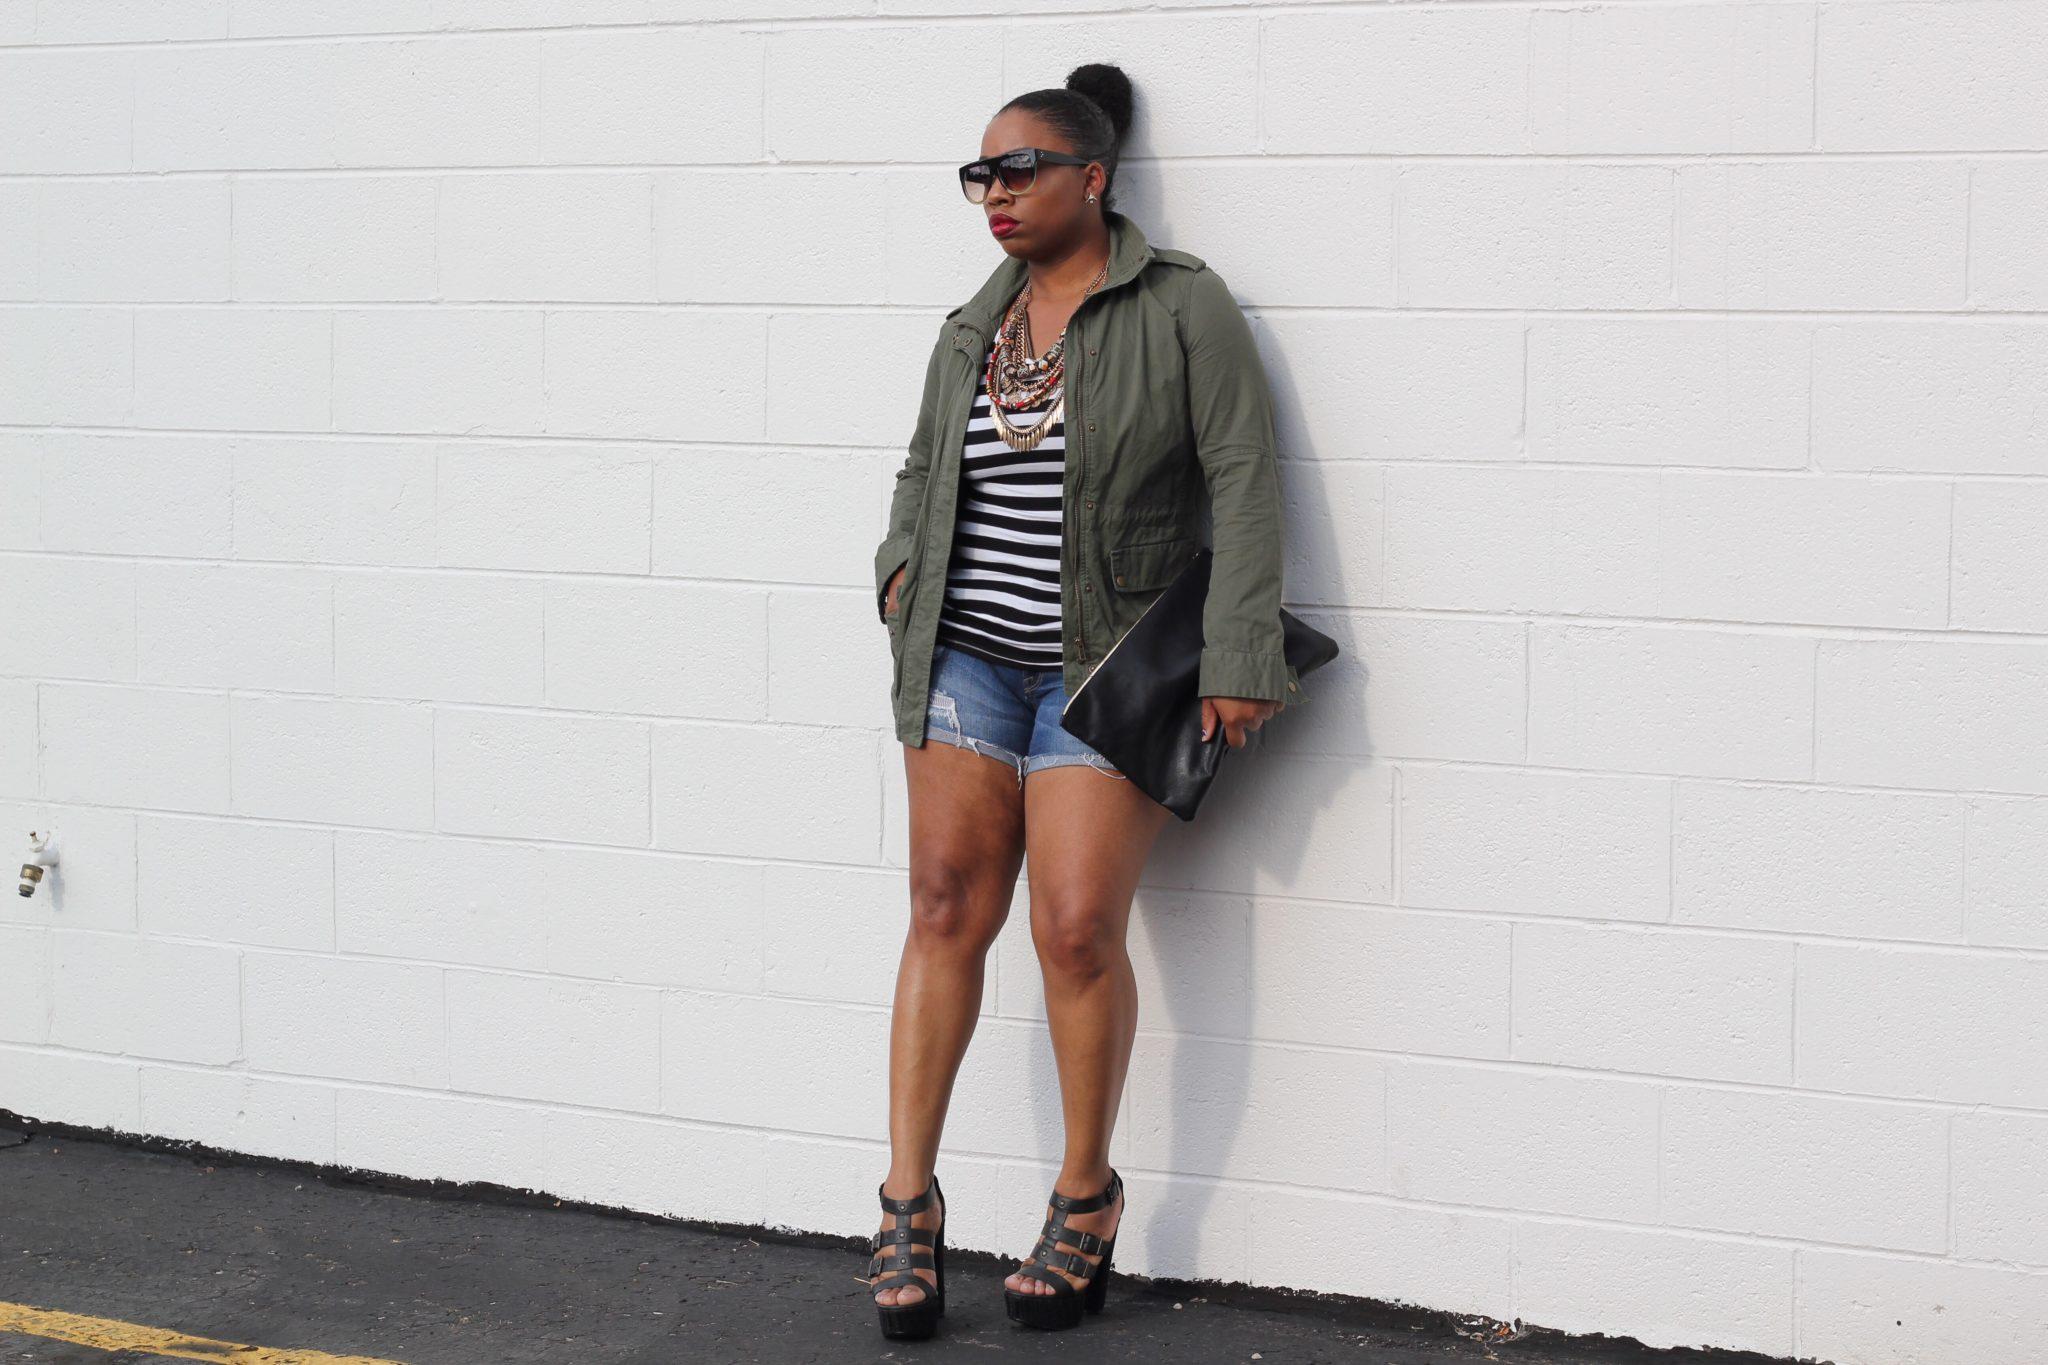 publish_snapshot-71 Hot Days & Cooler NightsAldo Shoes American Apparel eBay Fashion Fashion Nova how to Jessica Simpson Shoes OOTD shopping Style How To's: Style Inspiration Stylewatch Styling Target Target Style Uncategorized